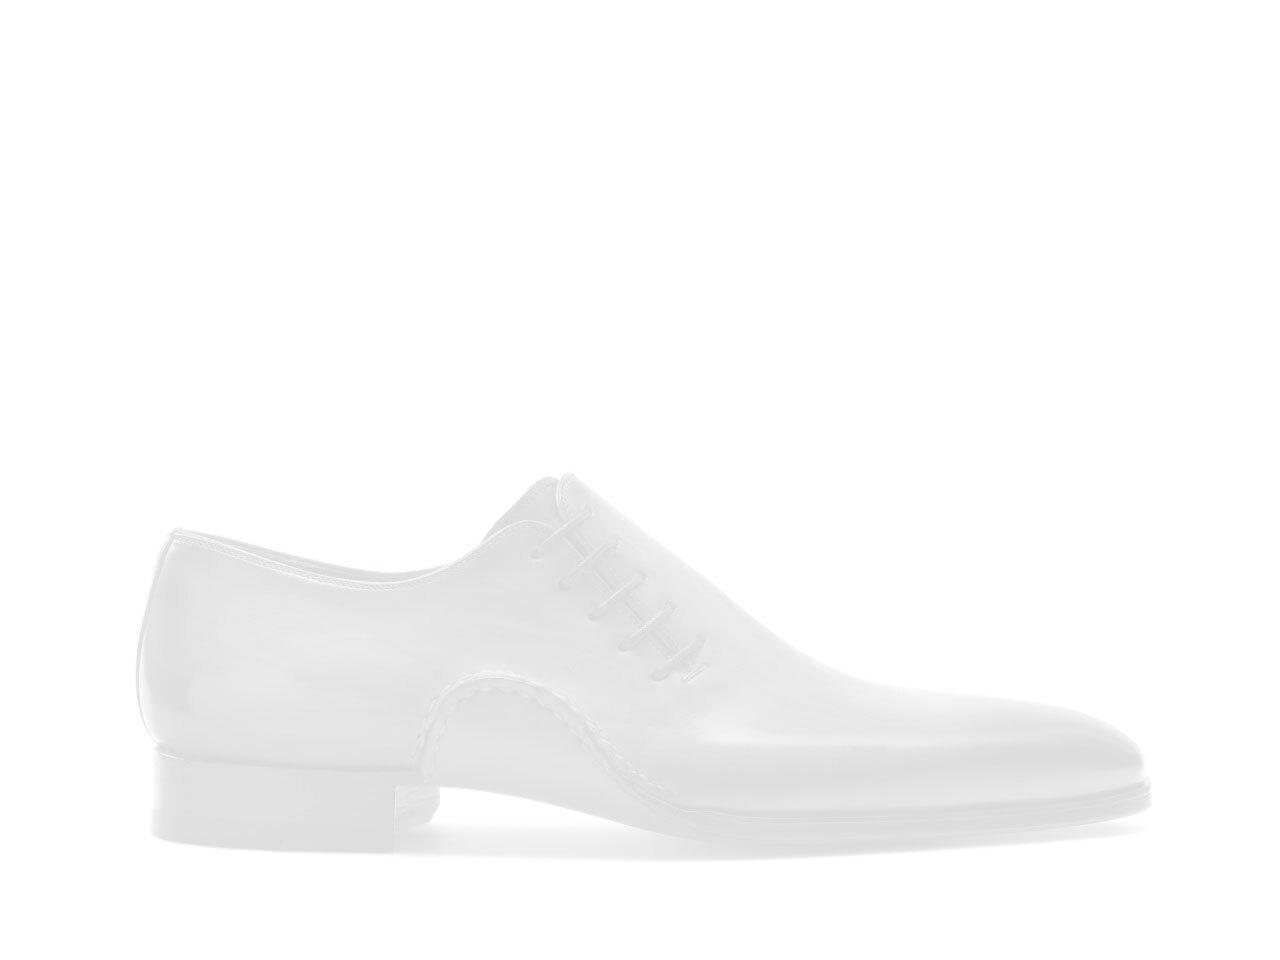 Magnanni Casual Dress Sock Ruby Men's Casual Socks